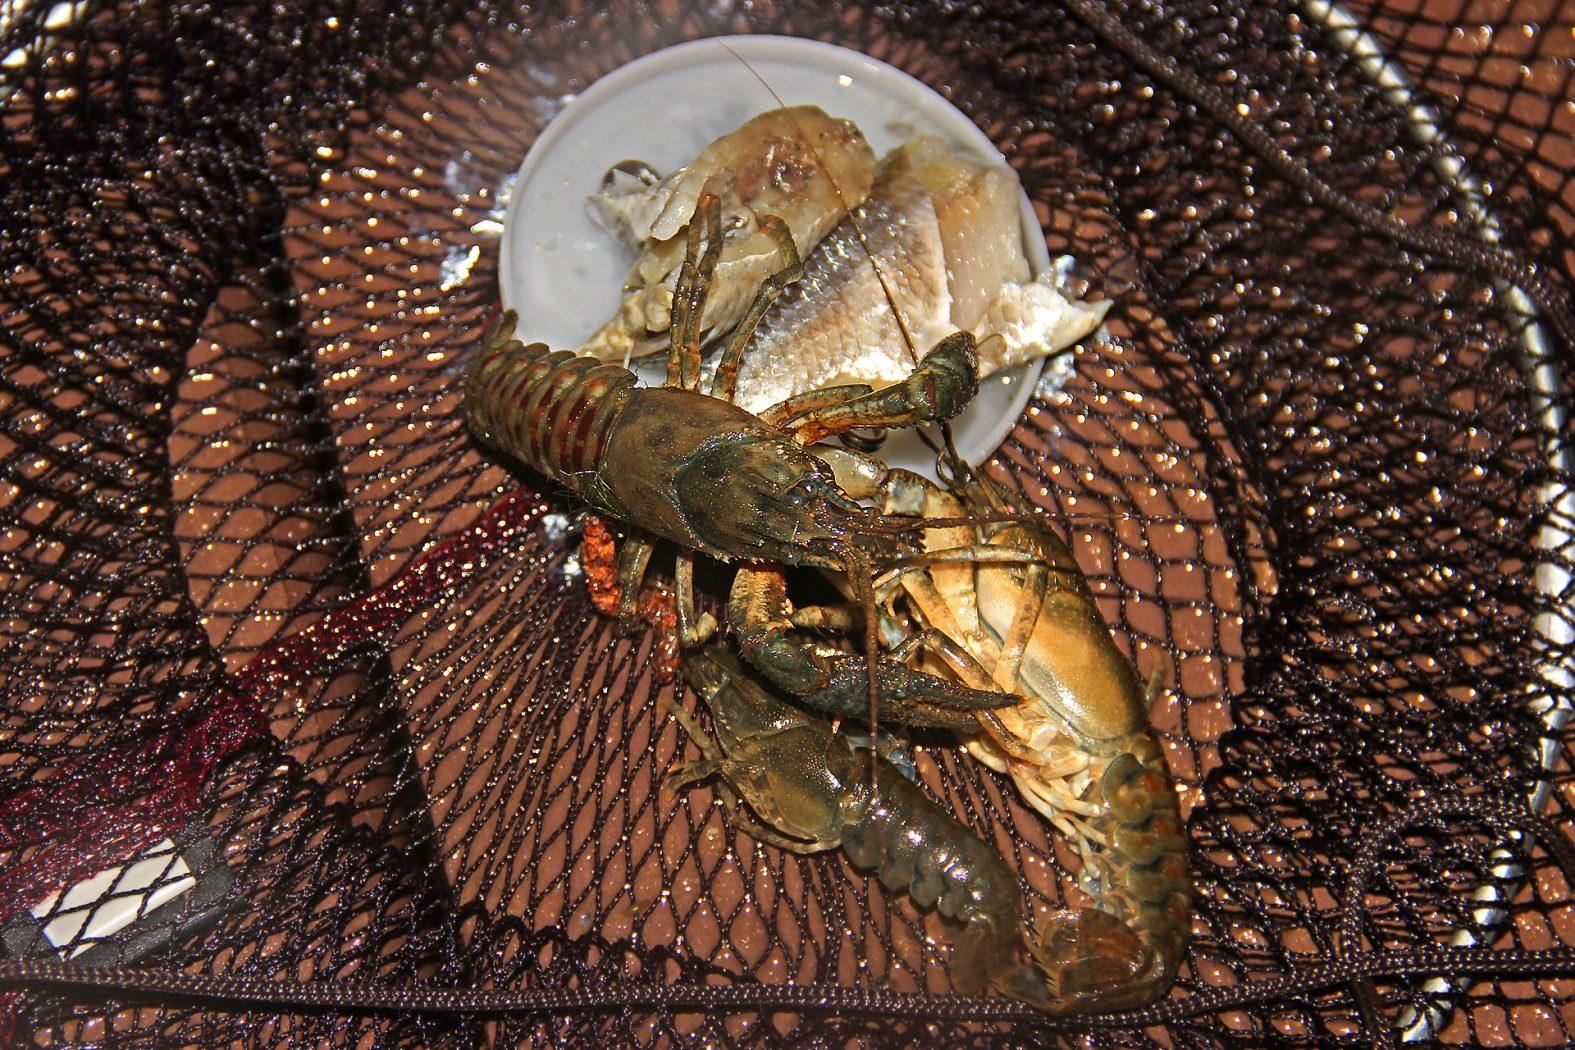 Flusskrebse fangen mit dem Krebsteller